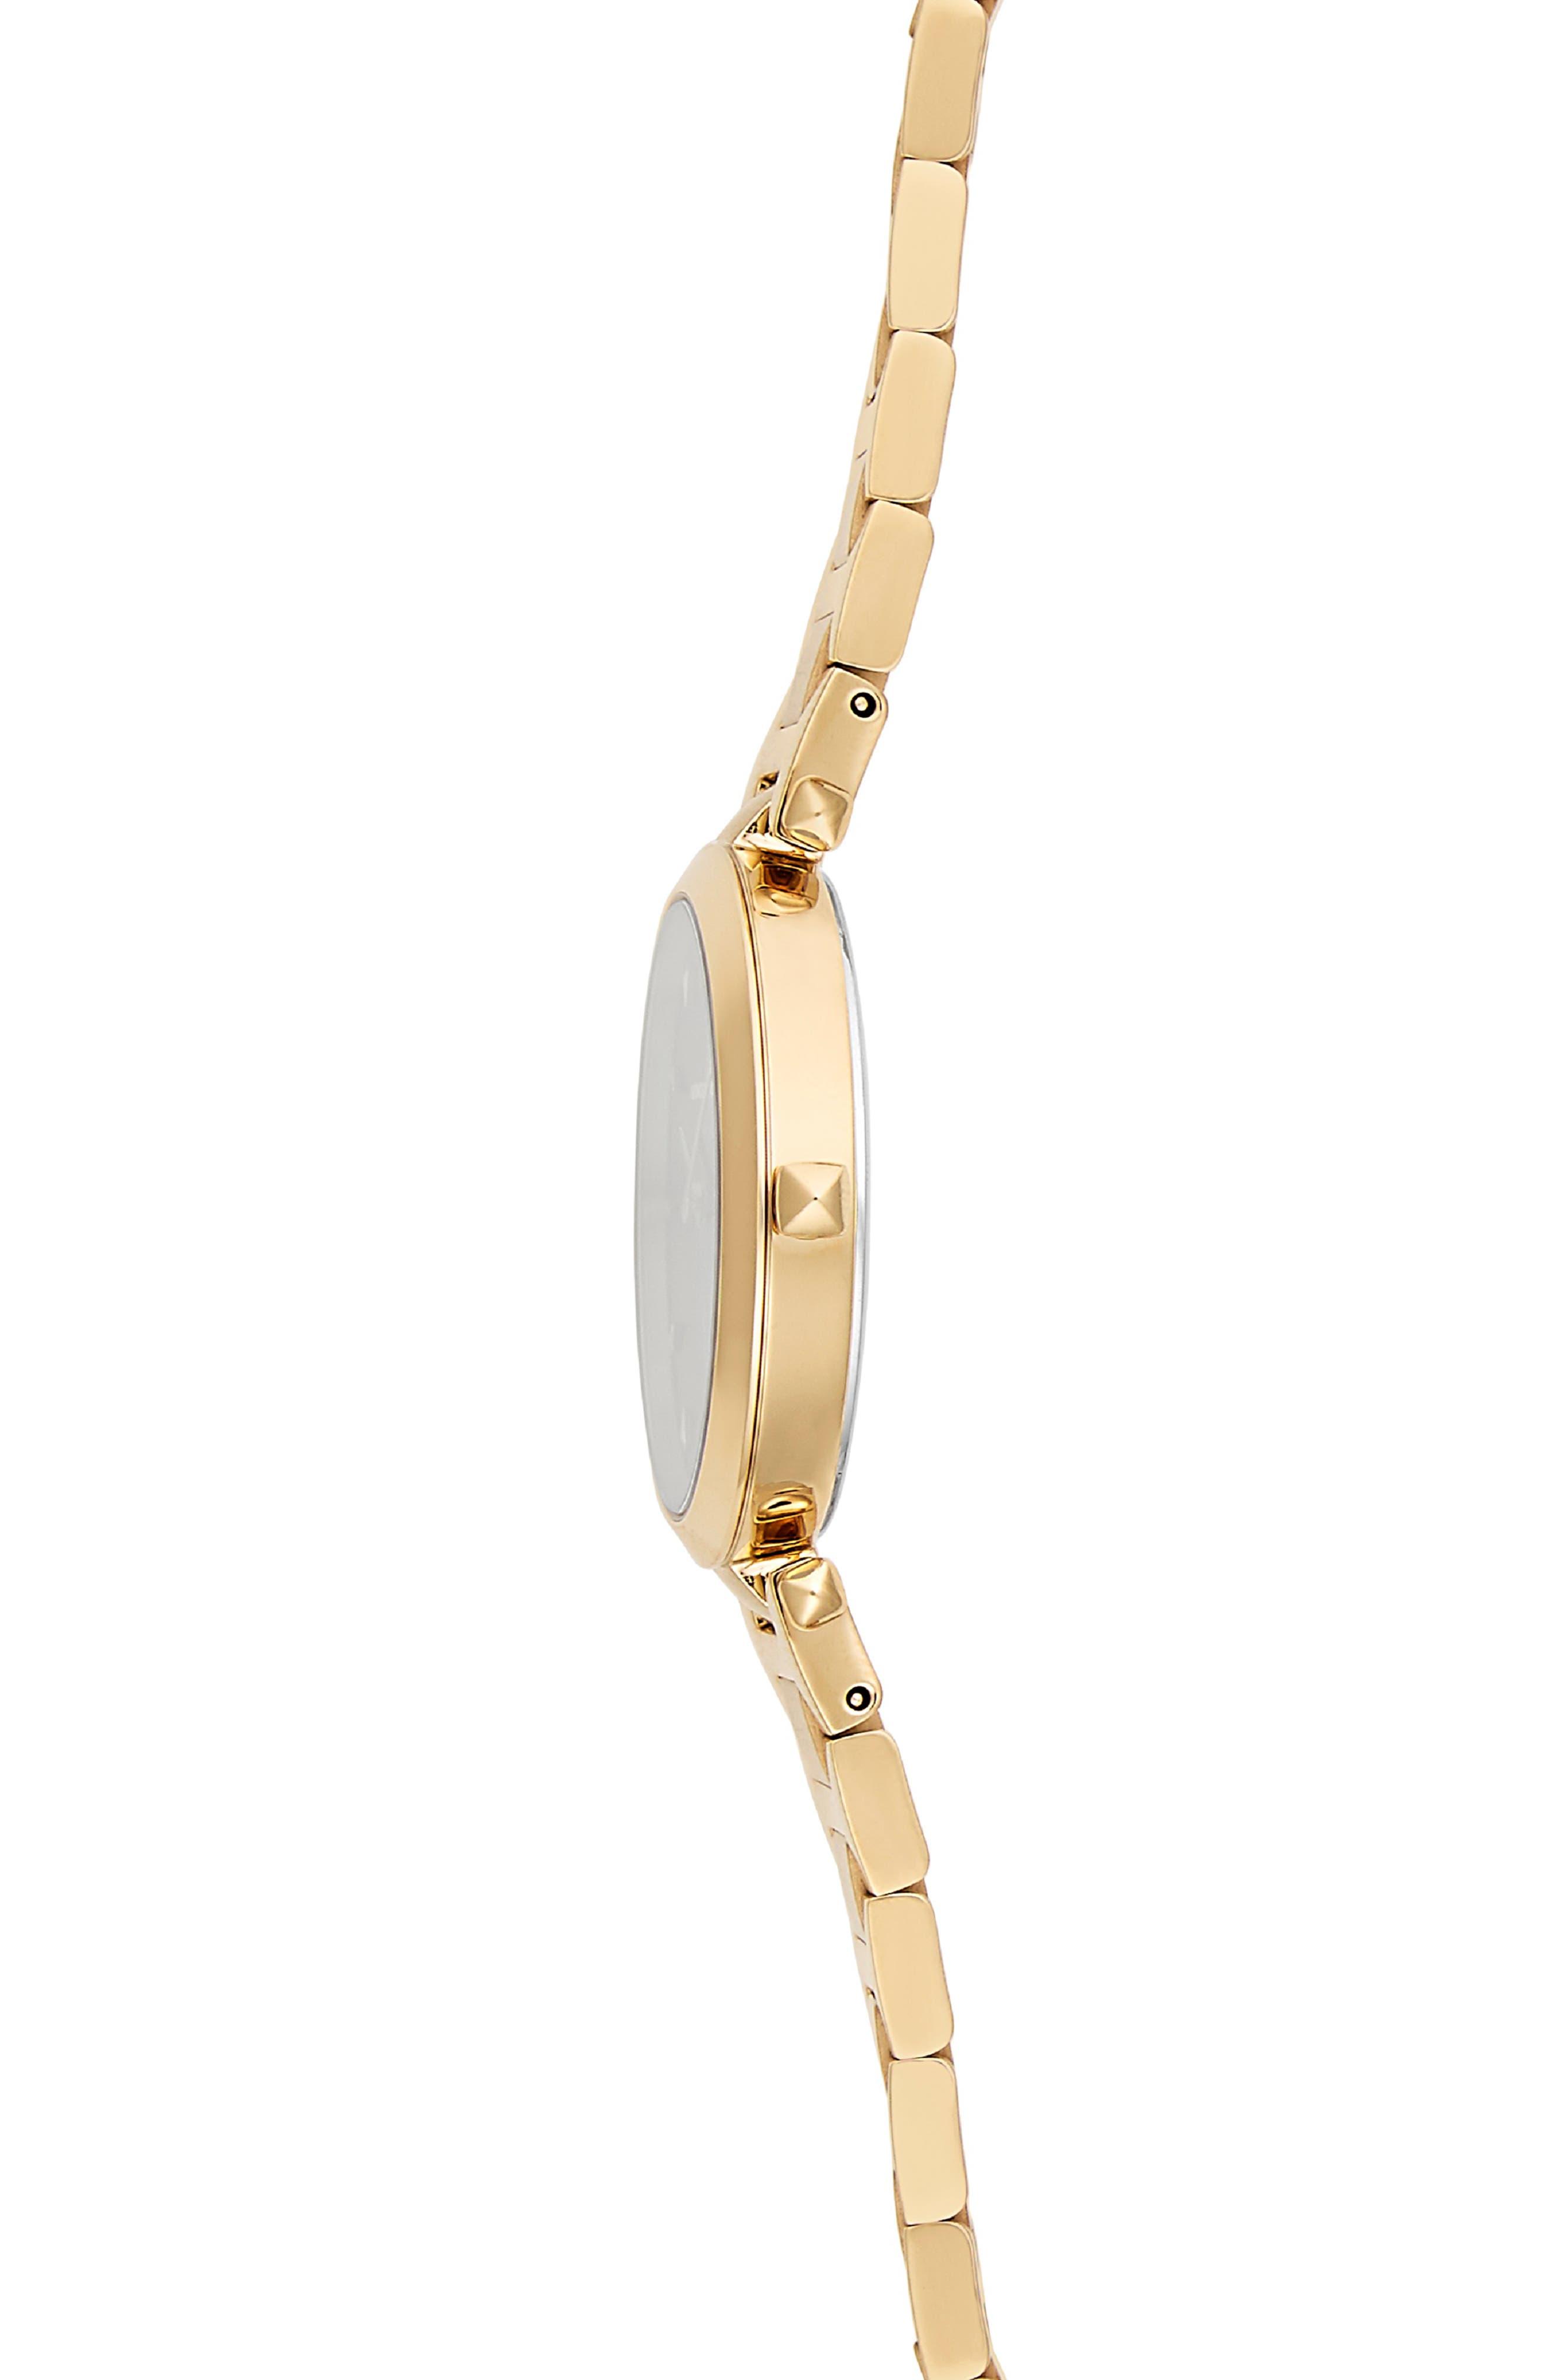 REBECCA MINKOFF, T-Bar Bracelet Strap Watch, 33mm, Alternate thumbnail 3, color, GOLD/ BLACK/ GOLD